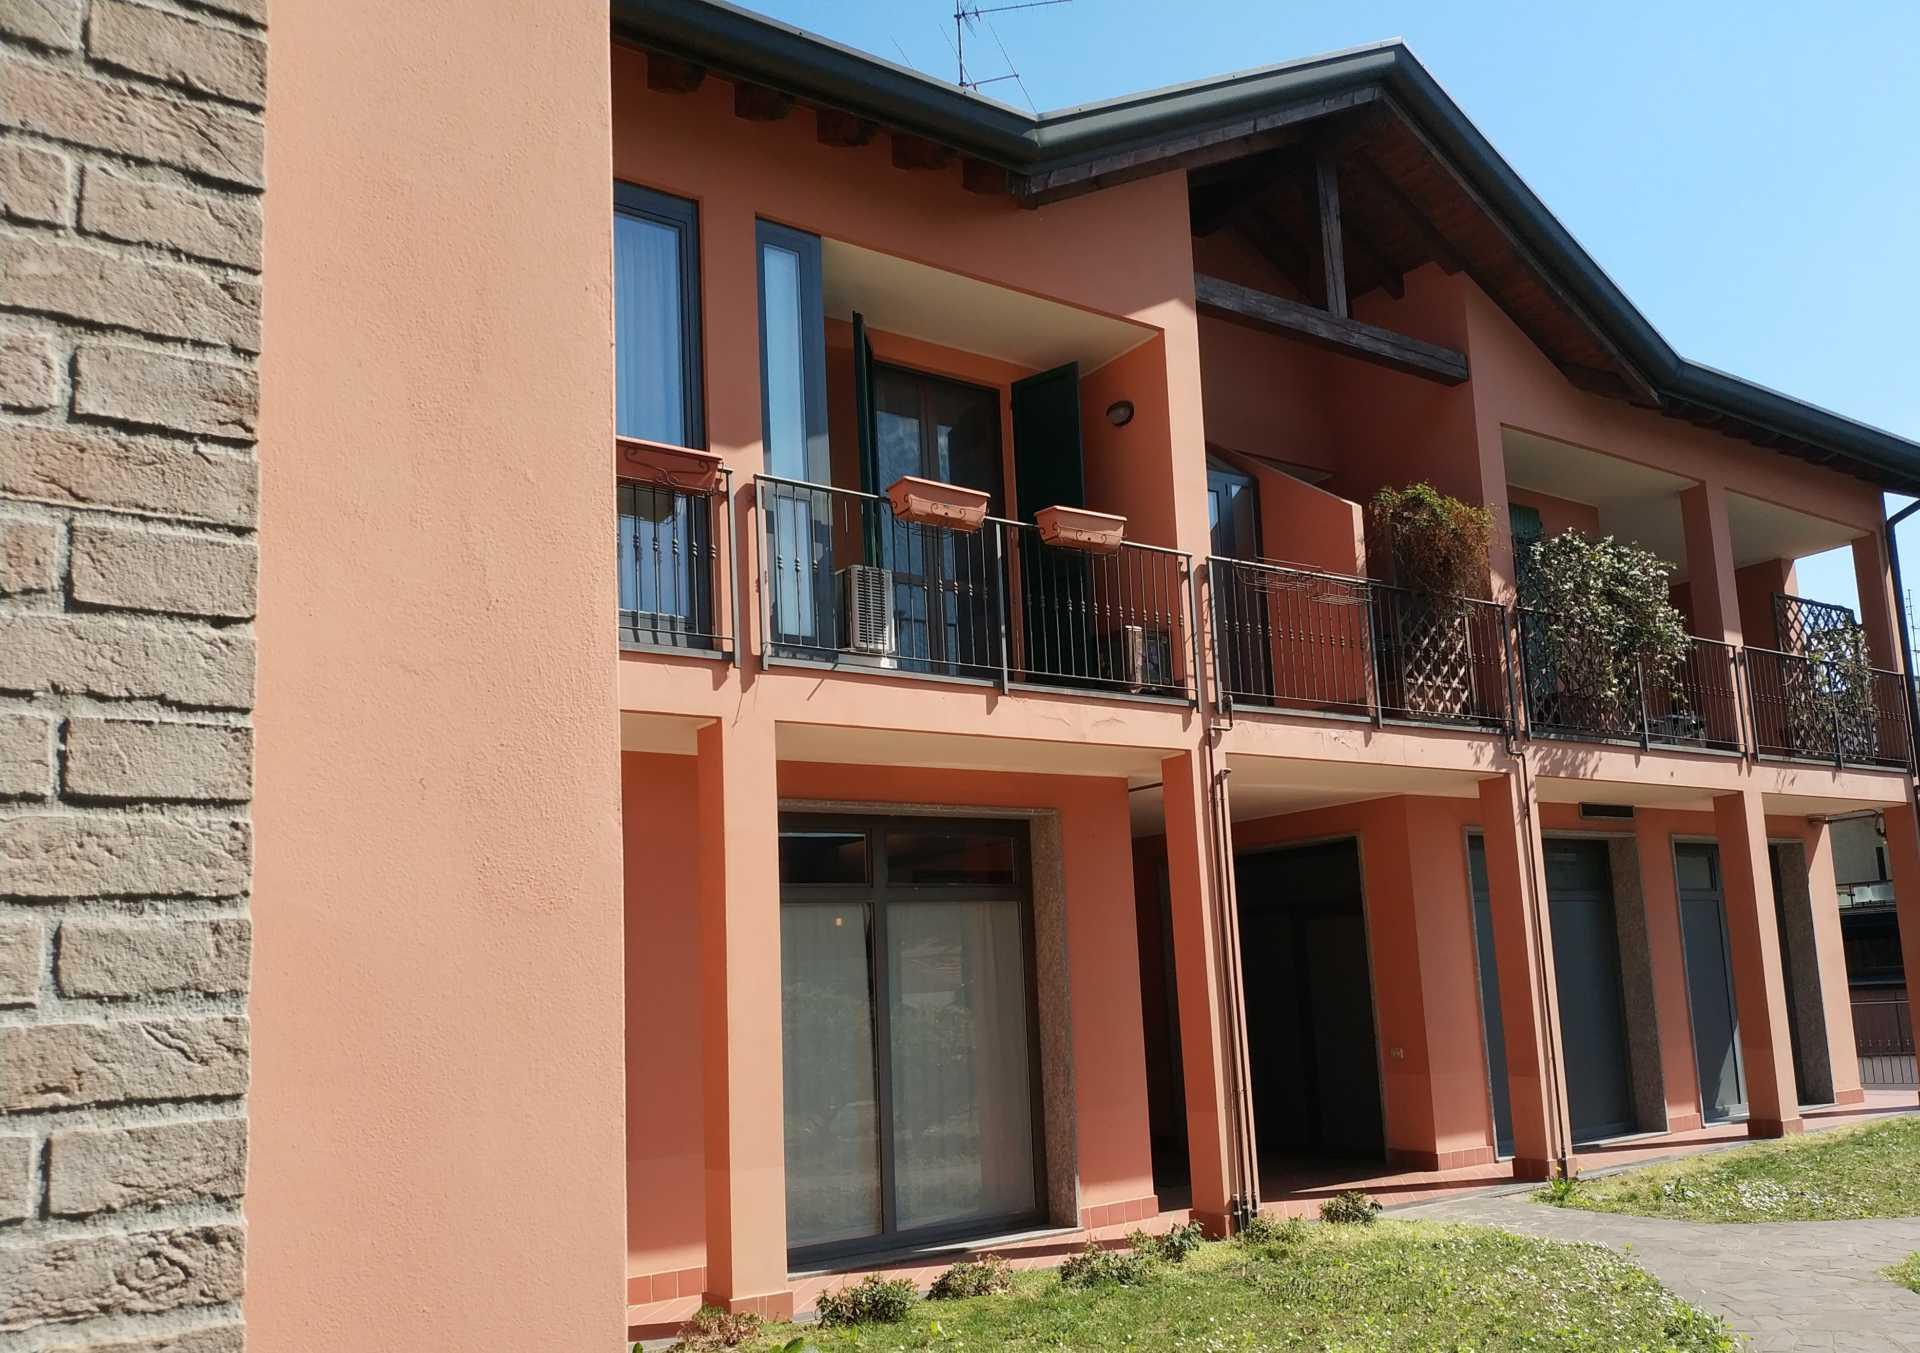 3 locali in vendita a cavenago brianza (5)